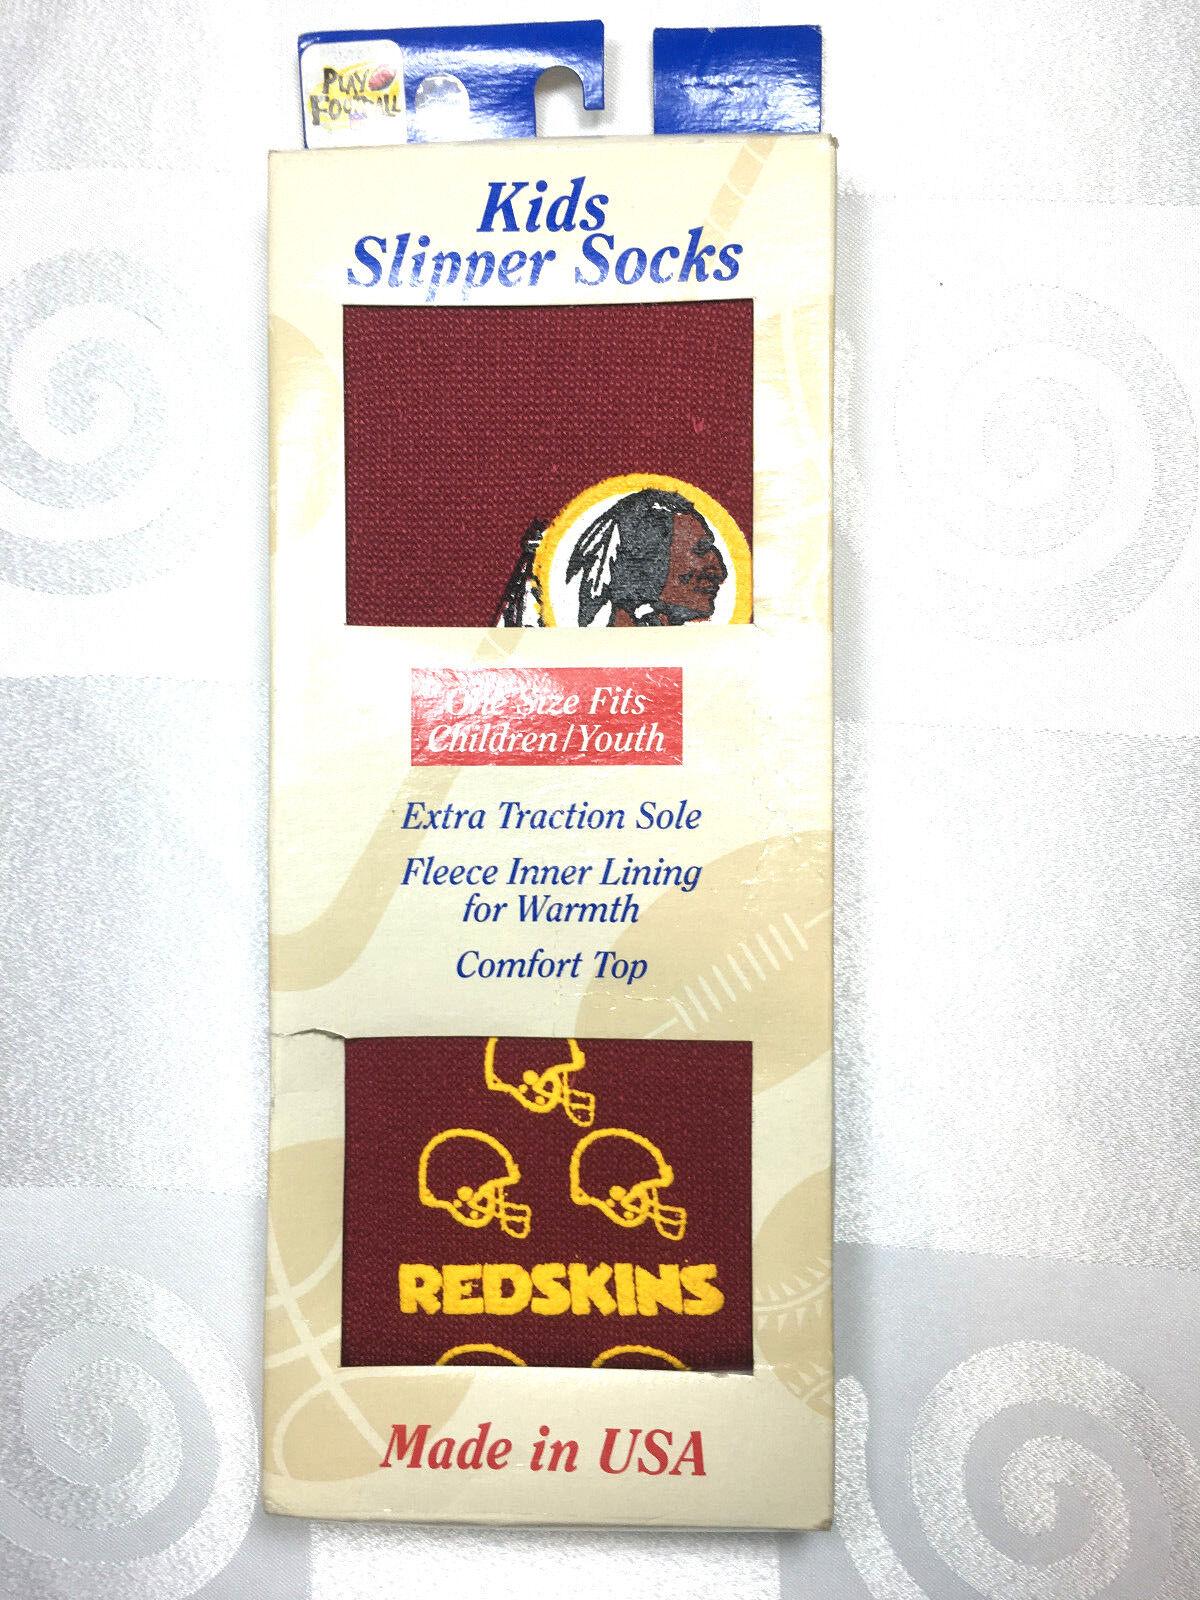 WASHINGTON RED SKINS NFL KIDS SLIPPER SOCKS UNISEX ONE SIZE FITS ALL MOST TEAMS Fan Apparel & Souvenirs